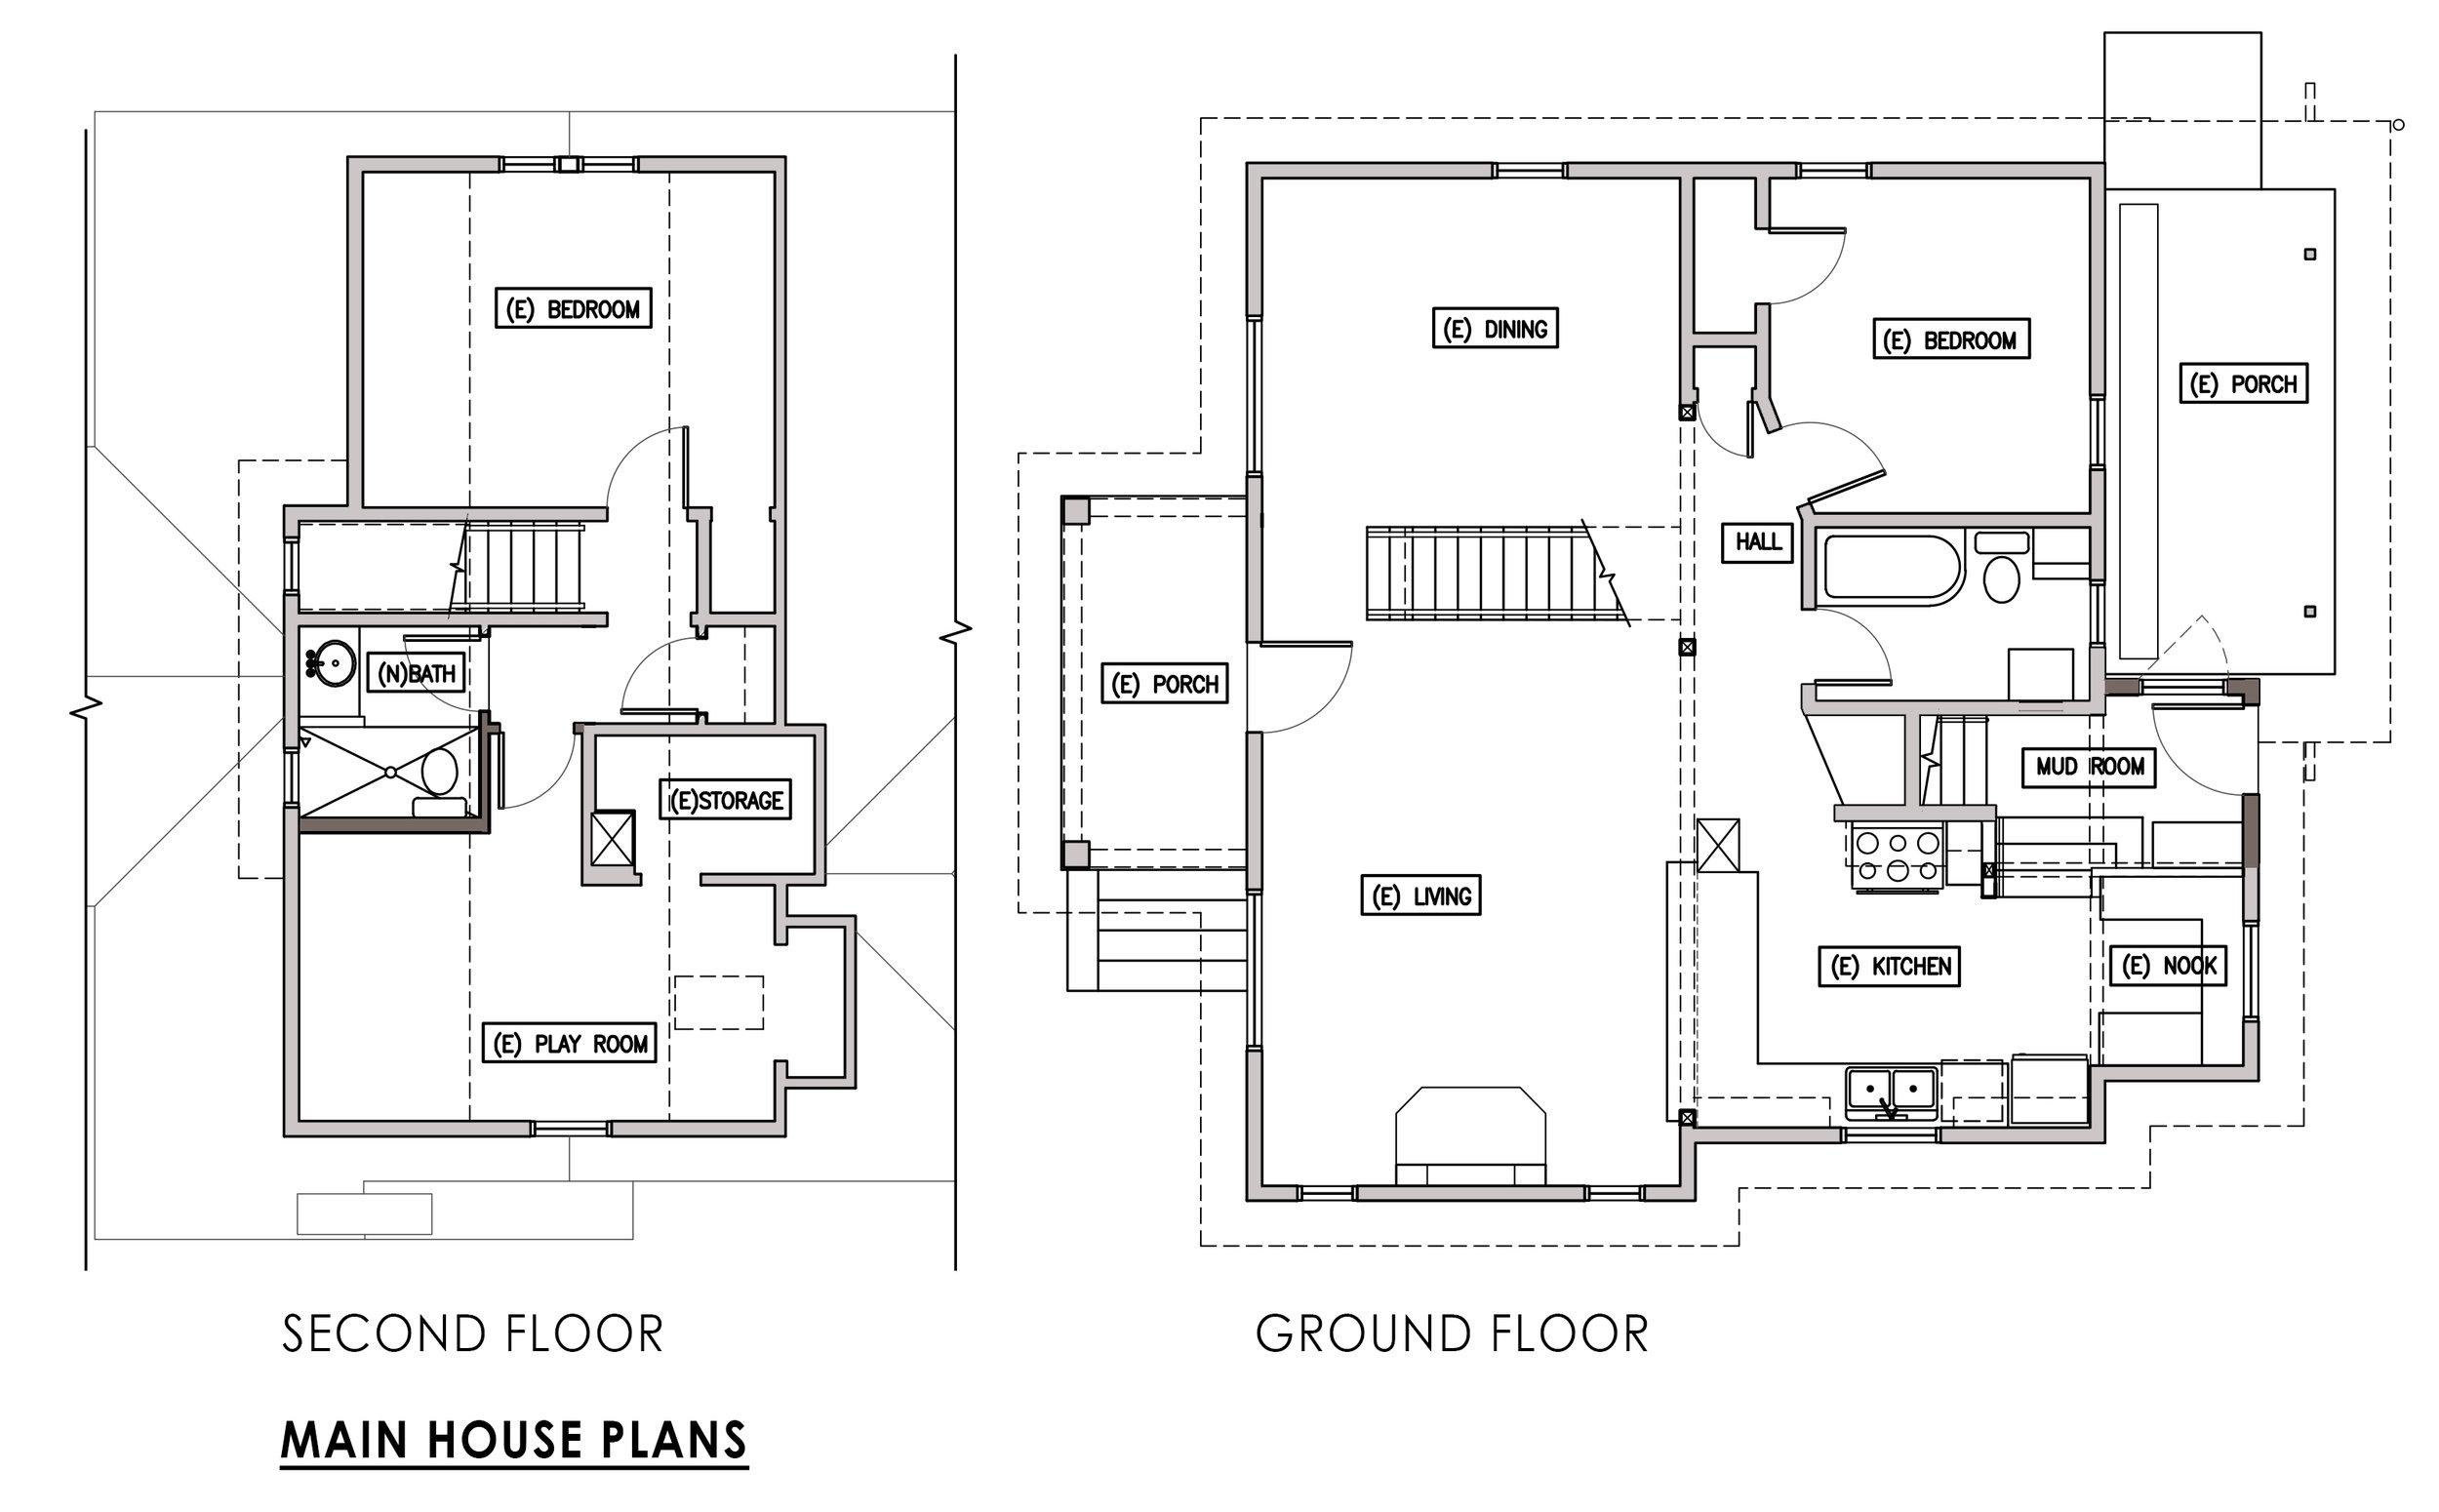 Harka Architecture_Hawthorne Remodel ADU (11).jpg